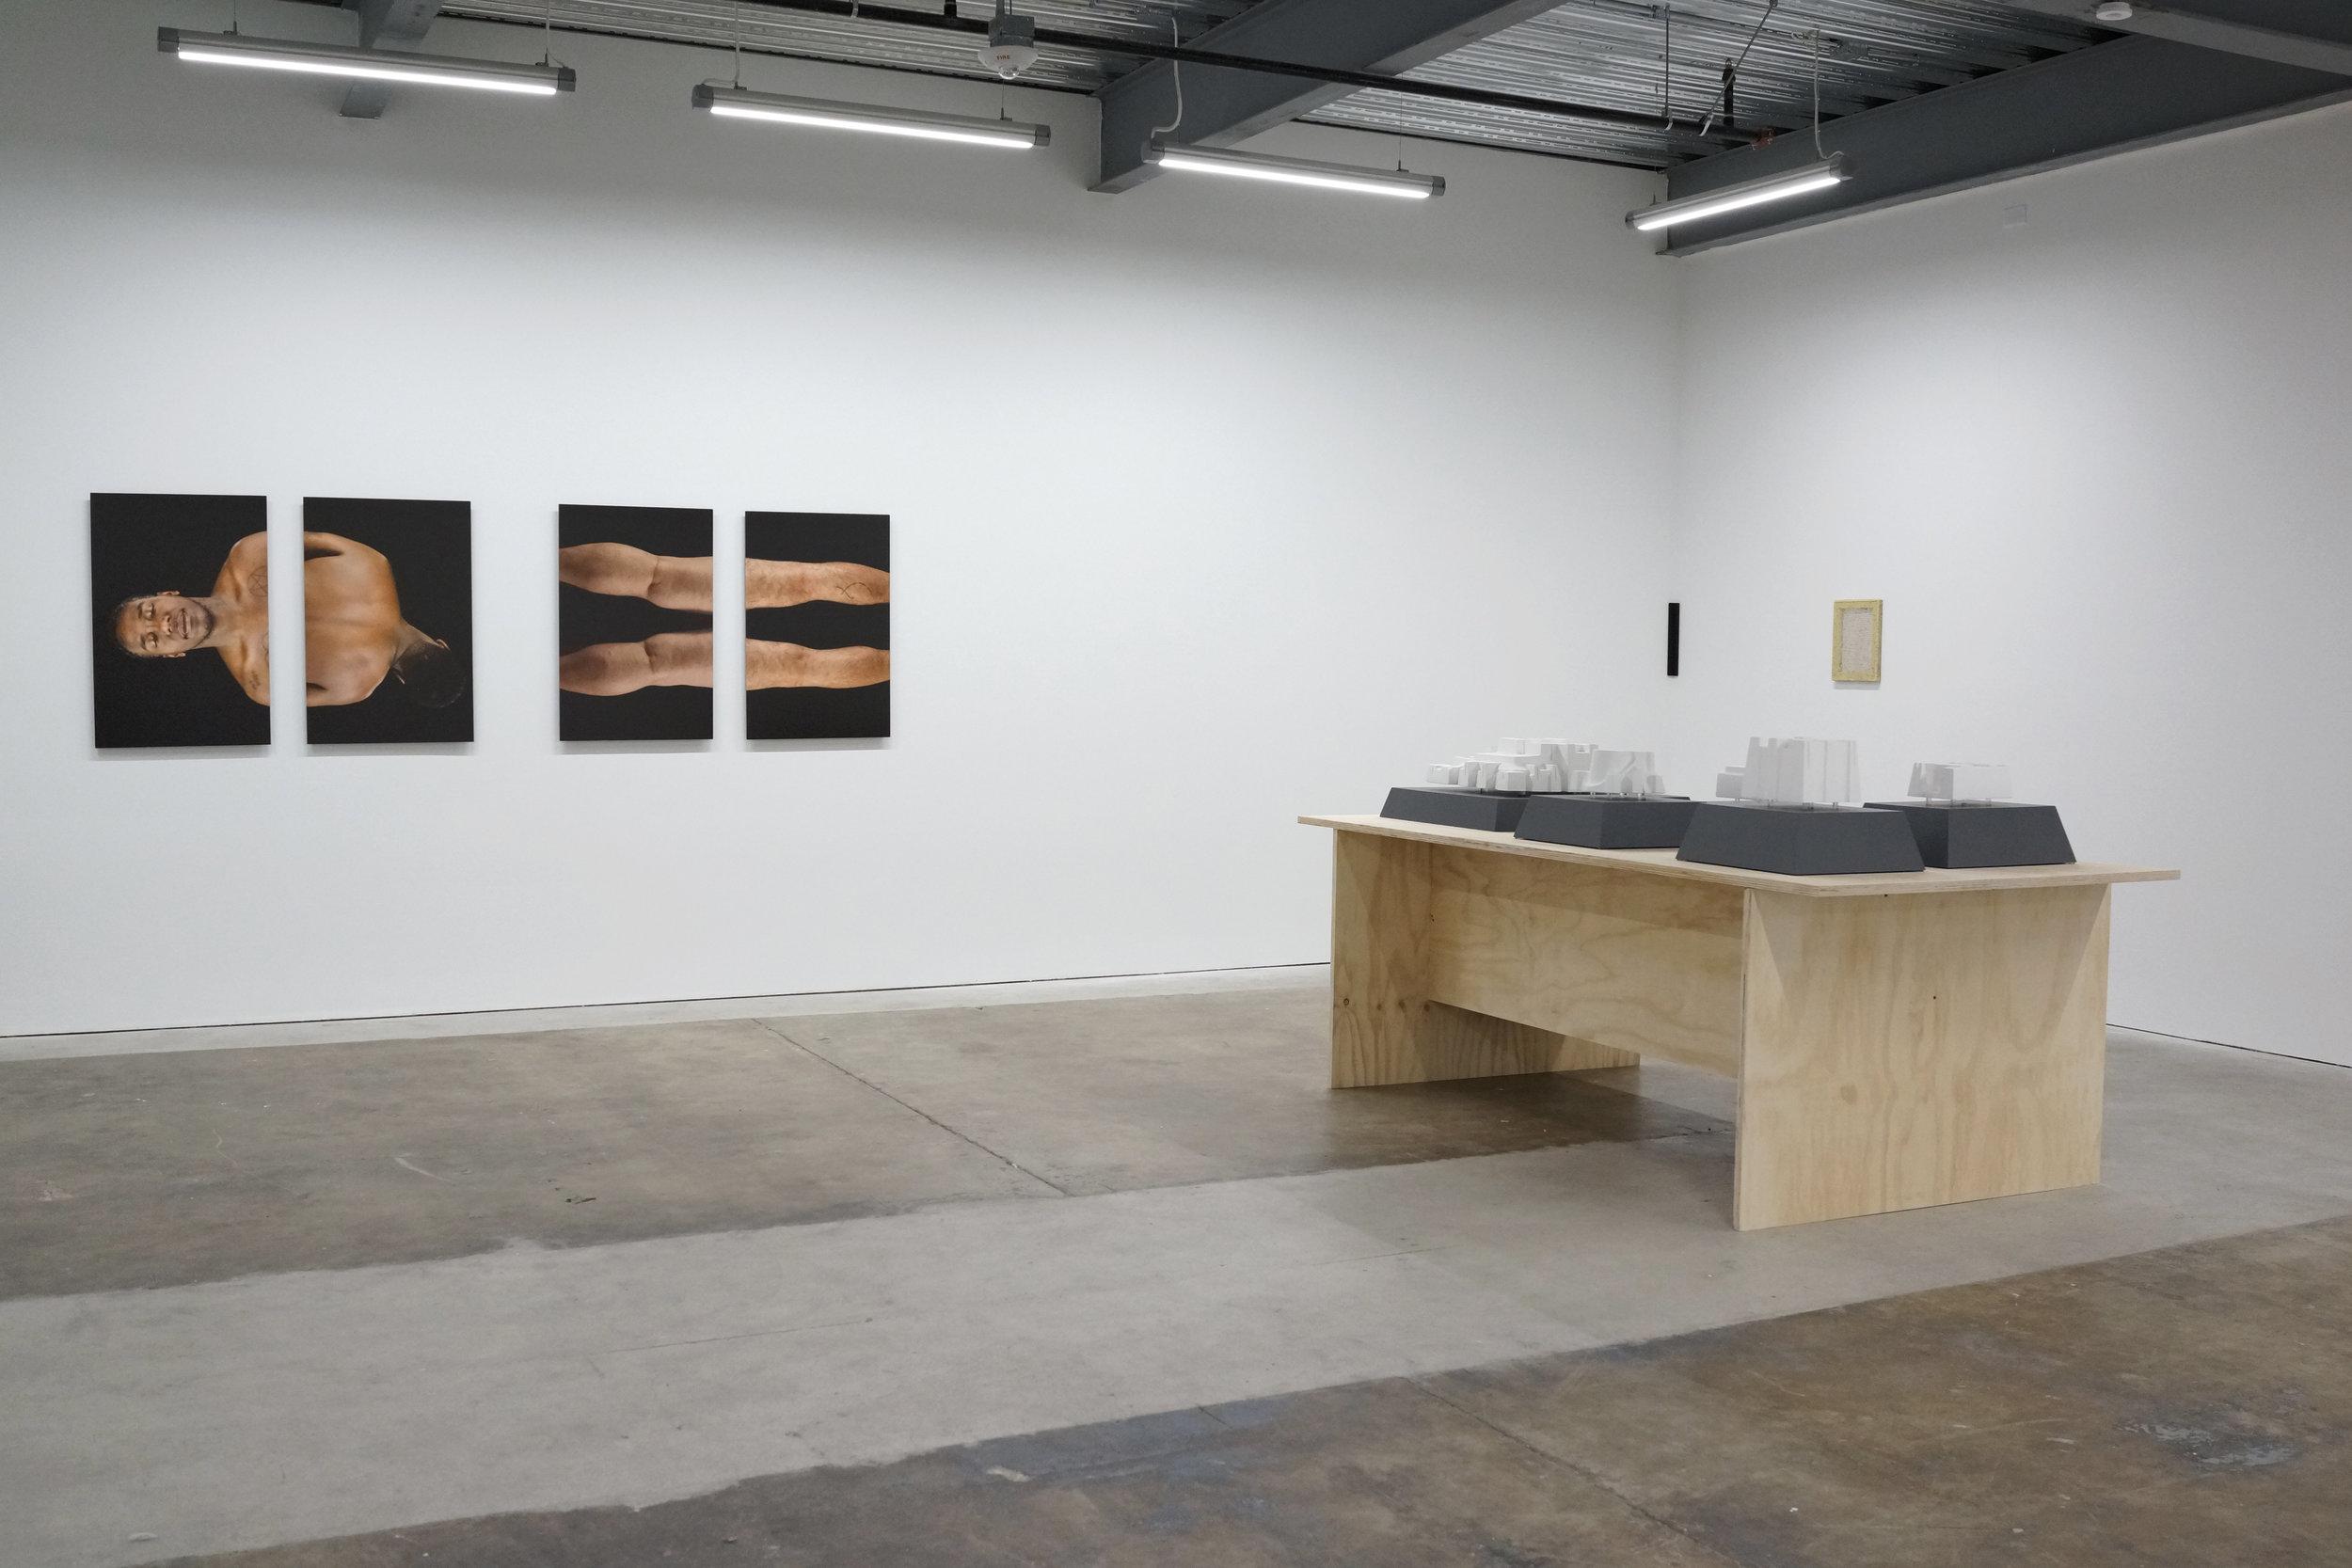 Installation view, L — Evie Leder, table — Masako Miyazaki, R — Gregory Kaplowitz